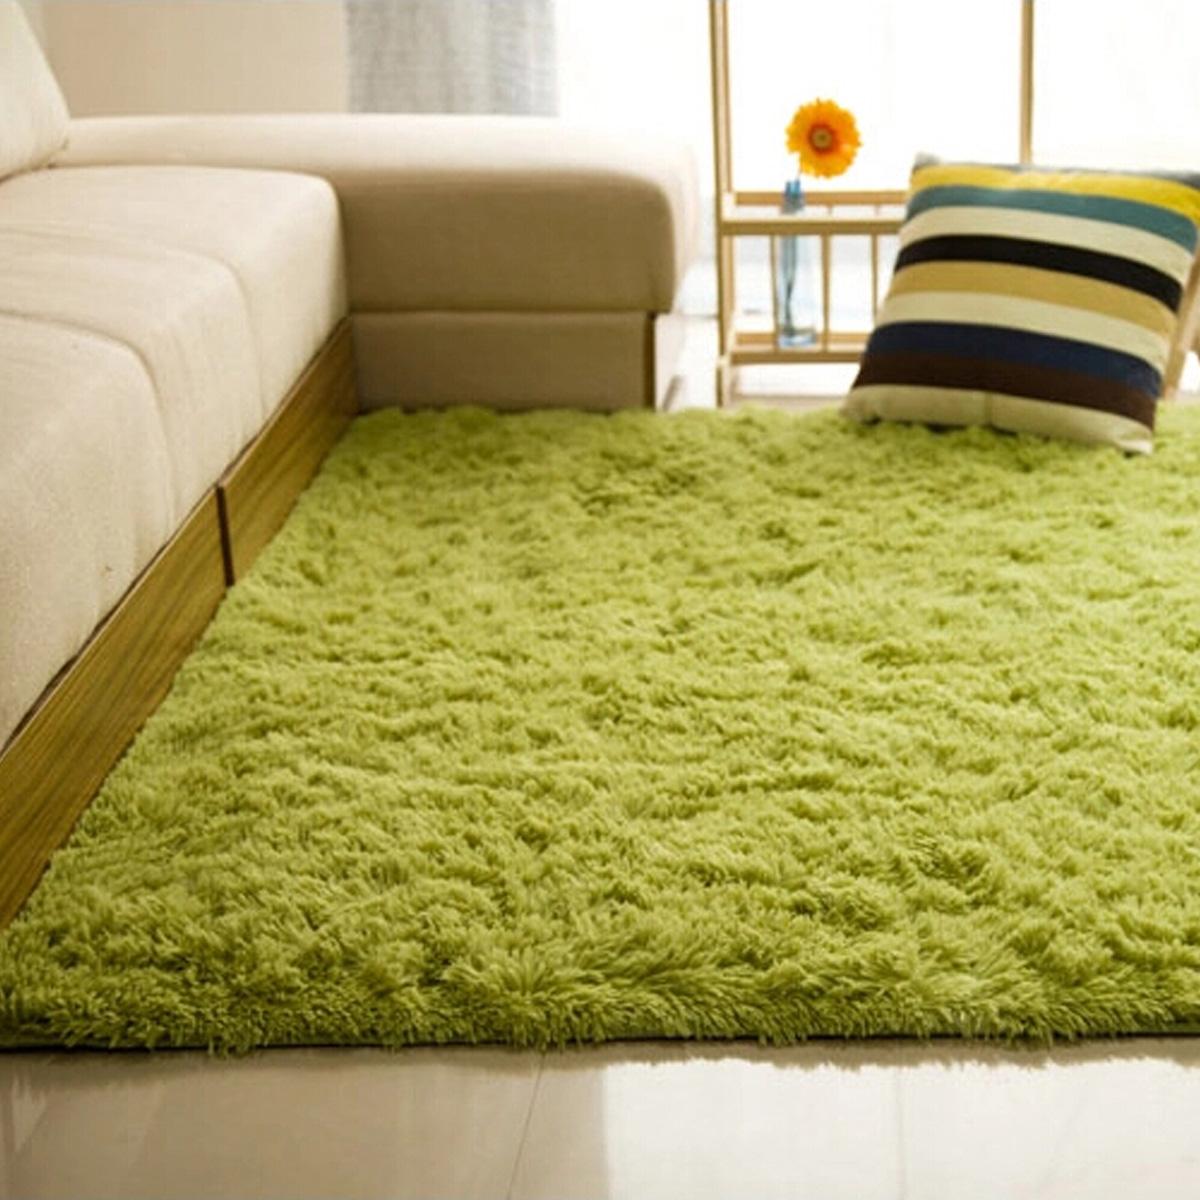 shaggy anti skid carpets rugs floor mat cover 80x120cm grass green